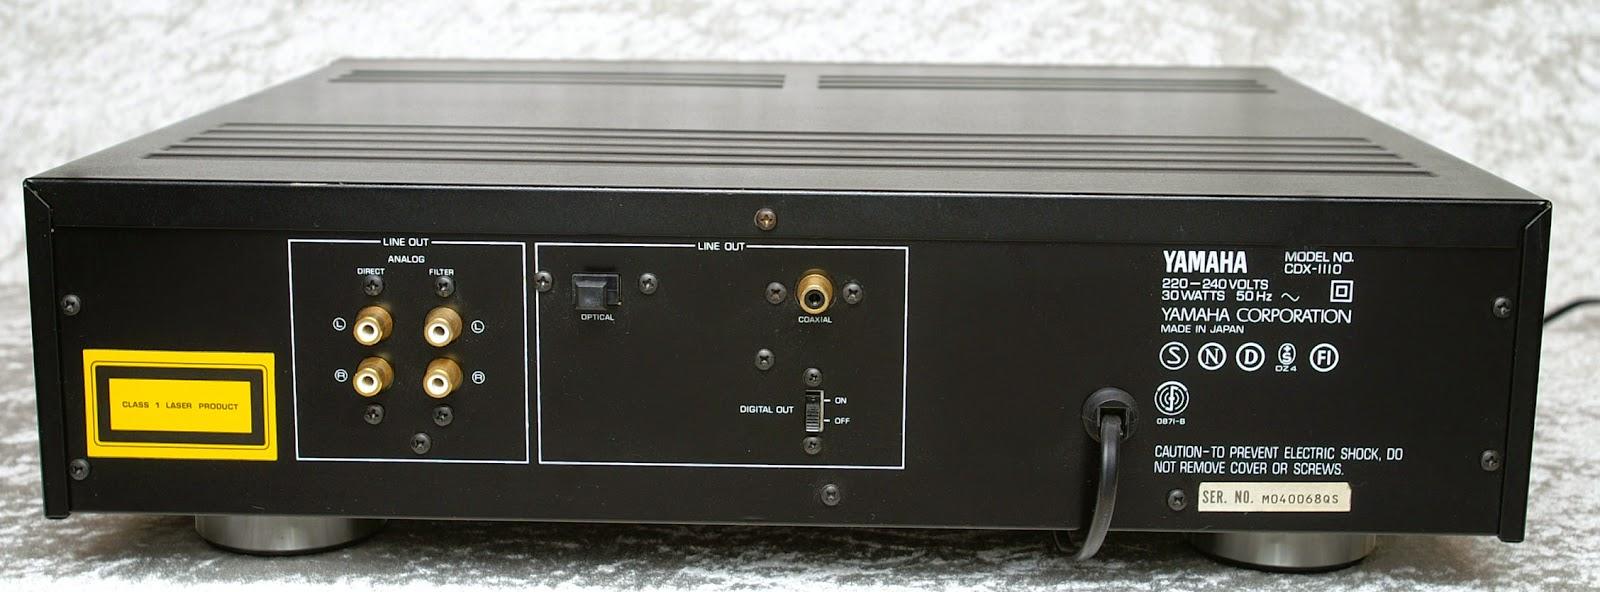 yamaha cdx 1110 cd player audiobaza. Black Bedroom Furniture Sets. Home Design Ideas